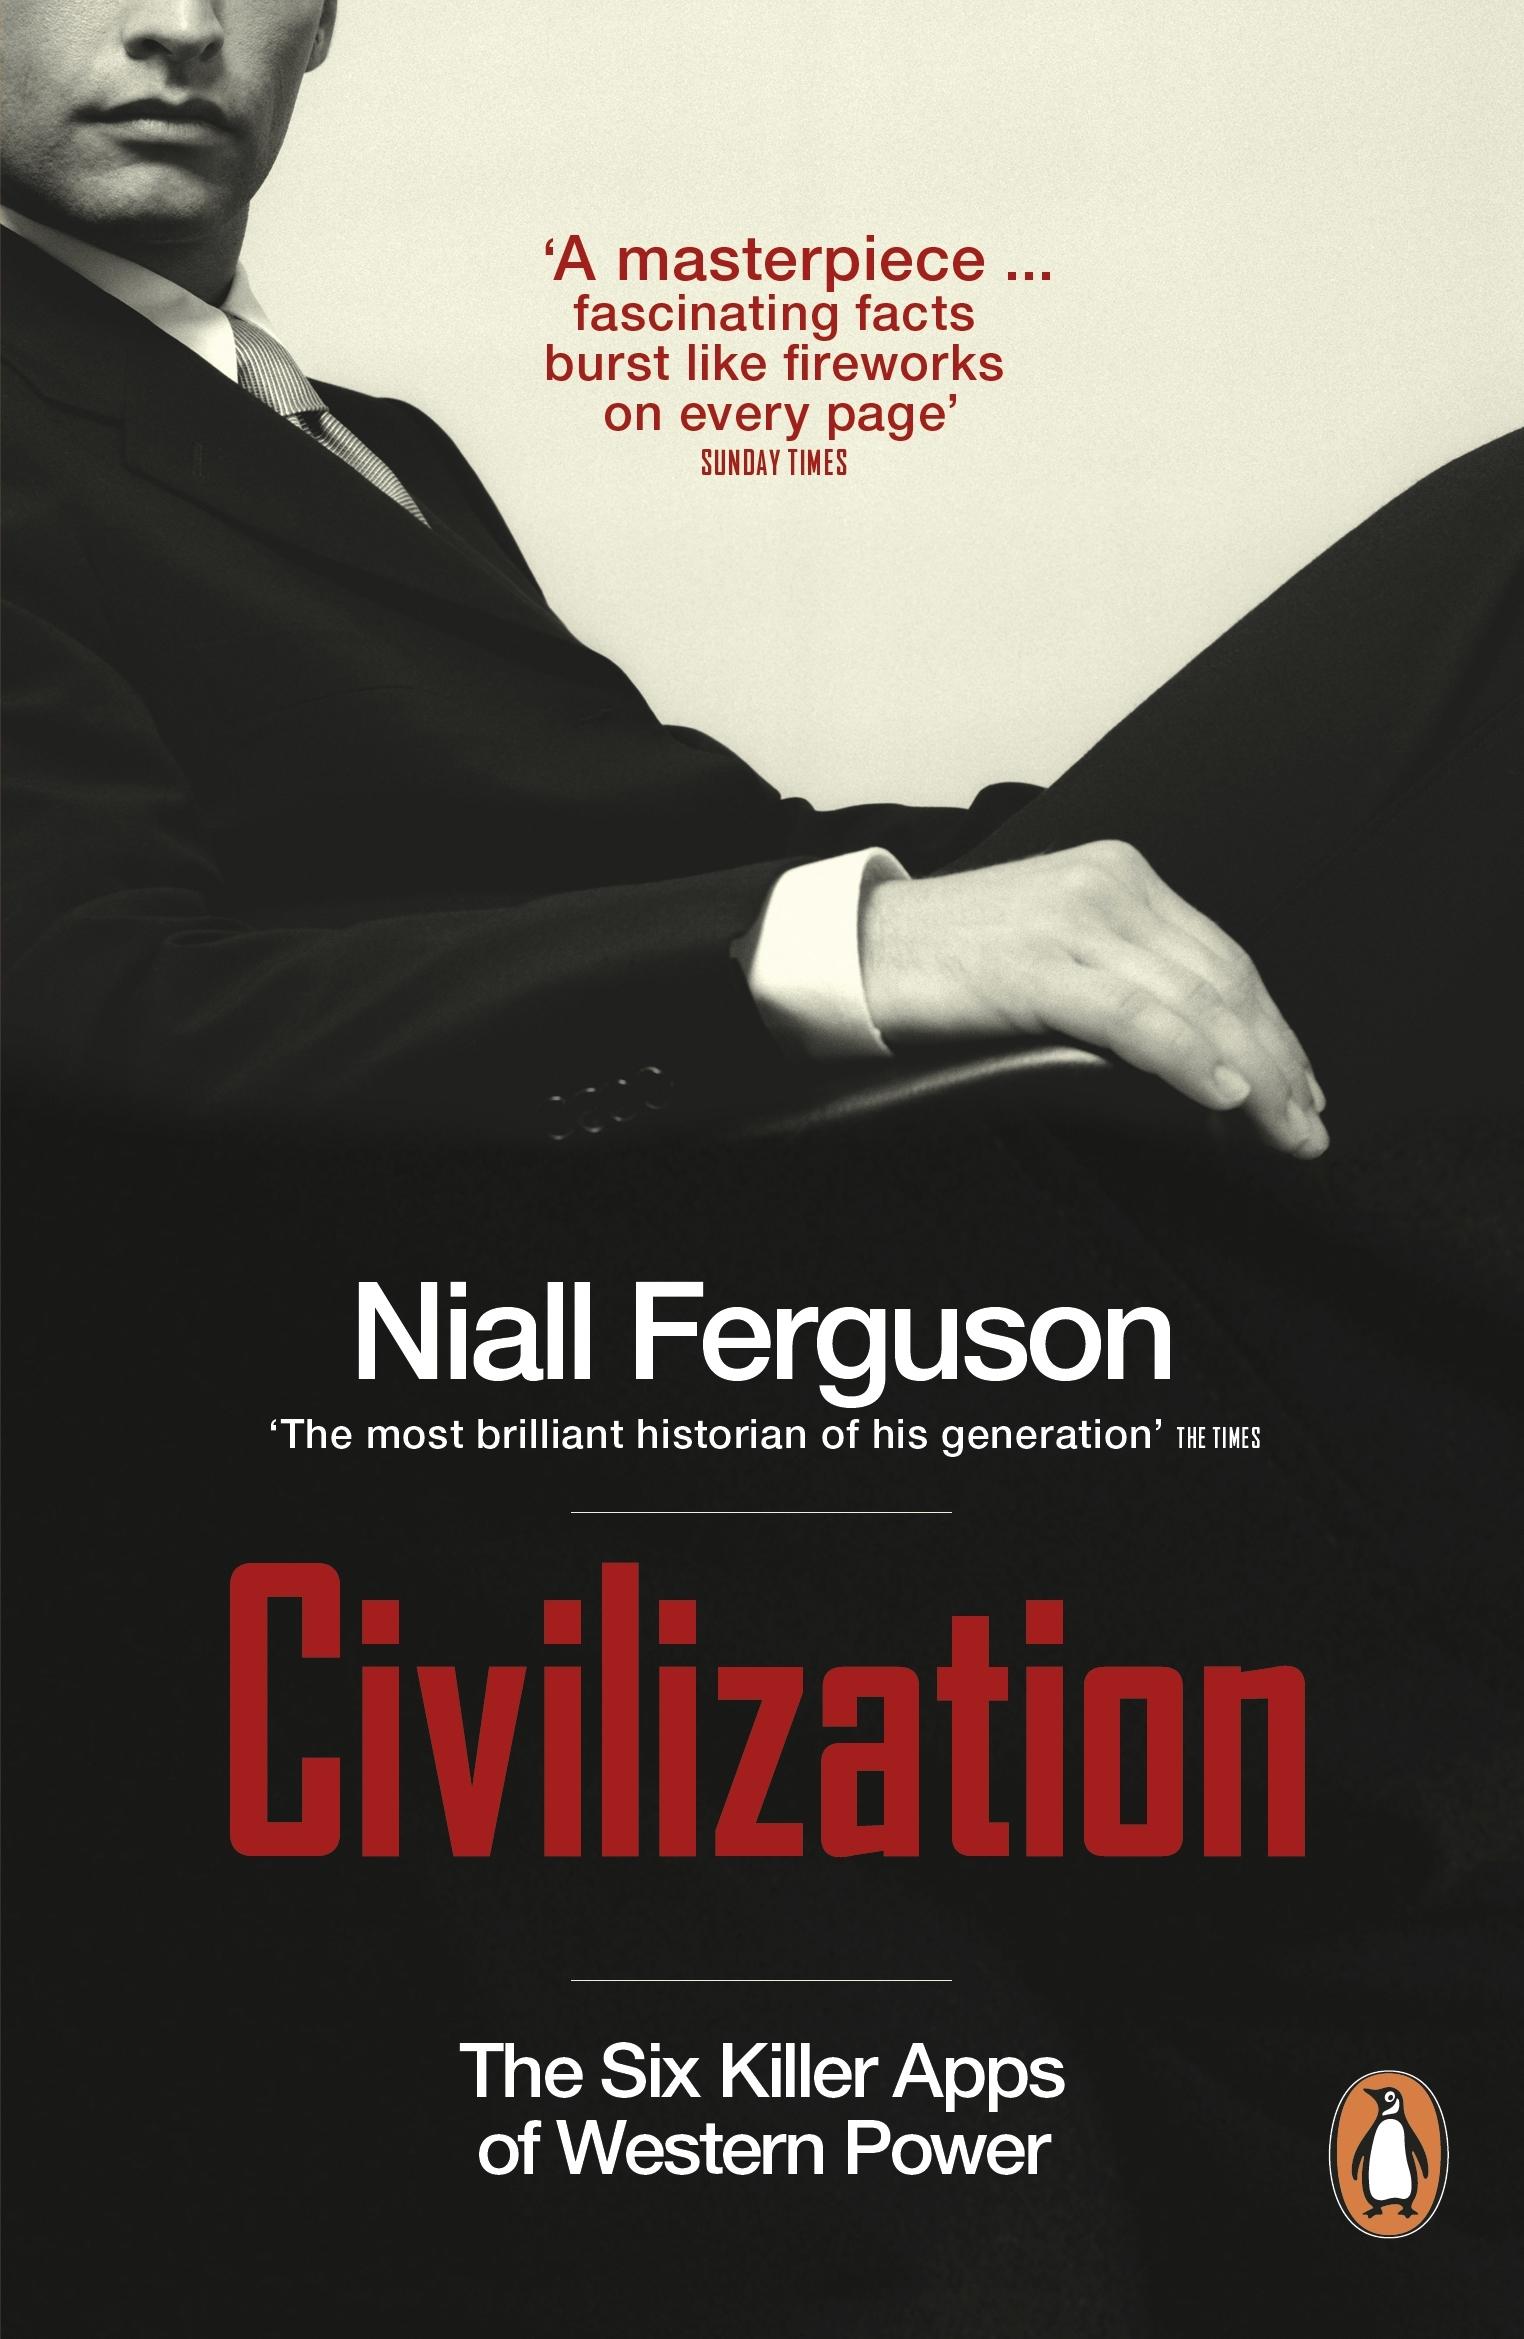 Niall Ferguson: Civilization (ePUB) - ebook download - english